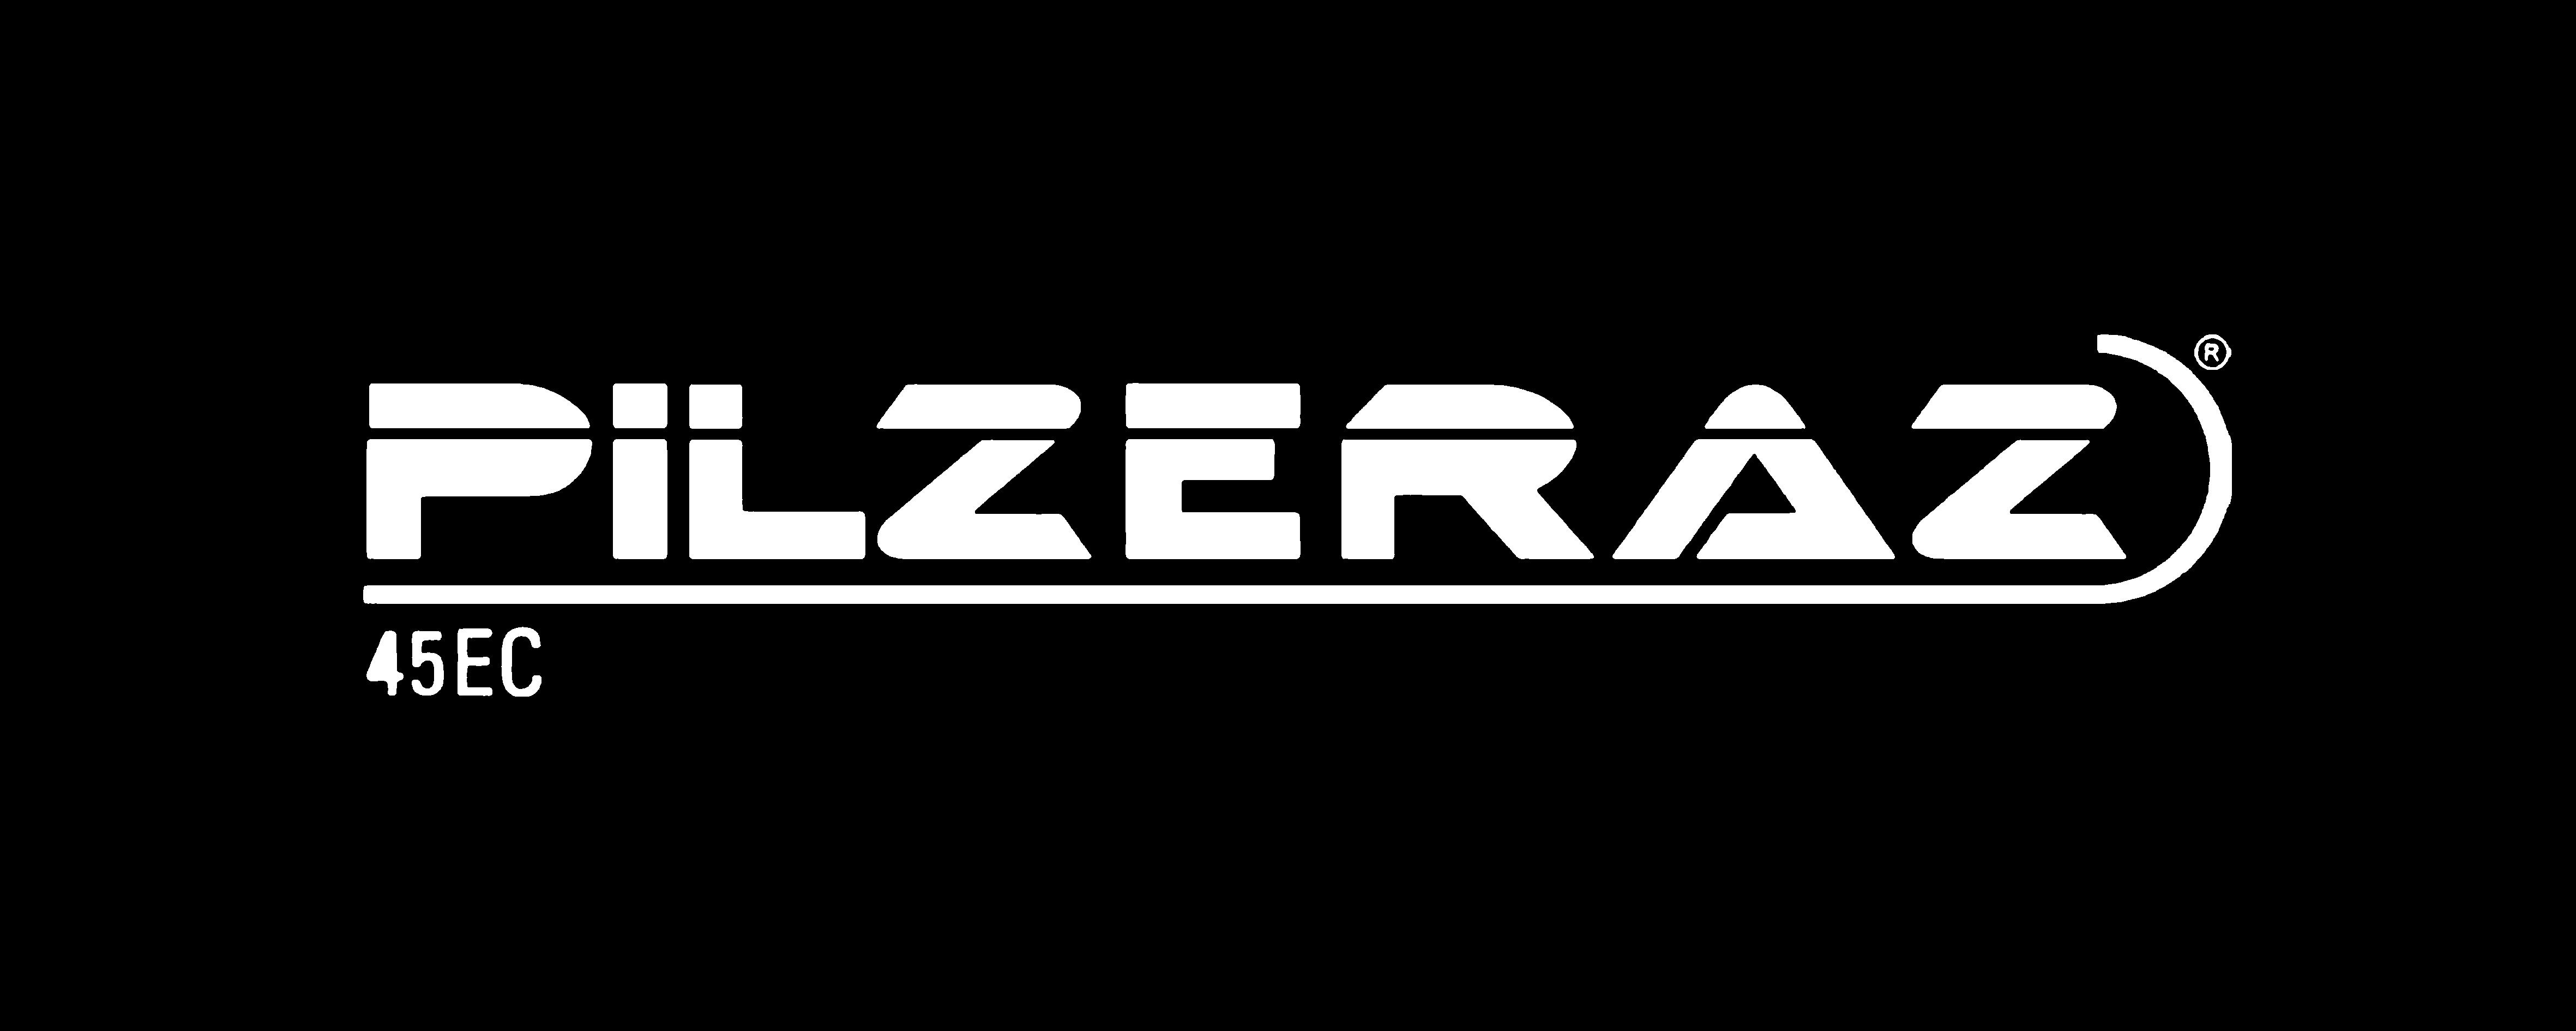 PILSERAZ